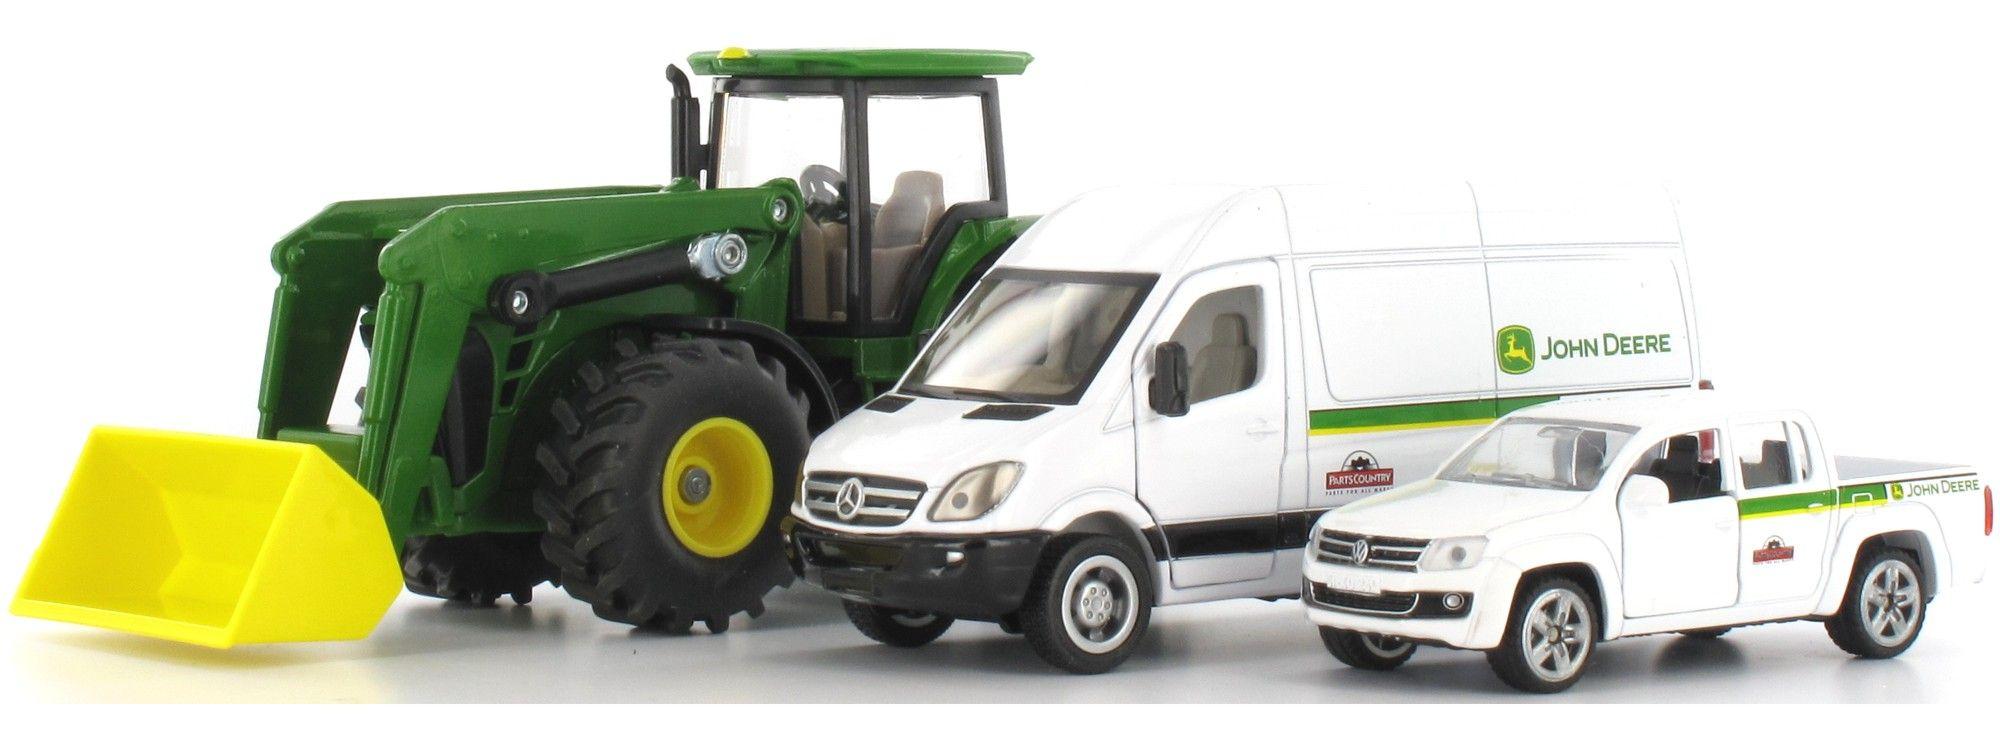 John Deere Baukasten Service Fahrzeug Spielzeugautos